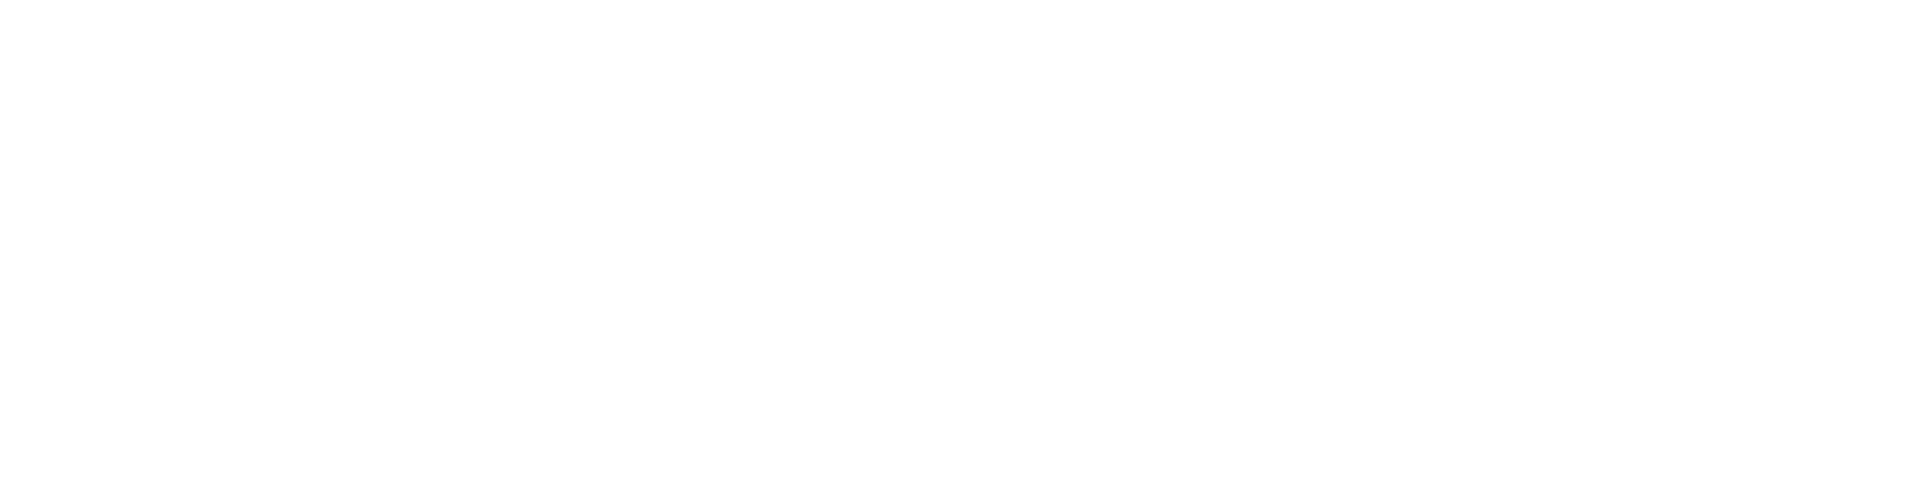 catalog/Sliders/novos/servicos-banner-3.png